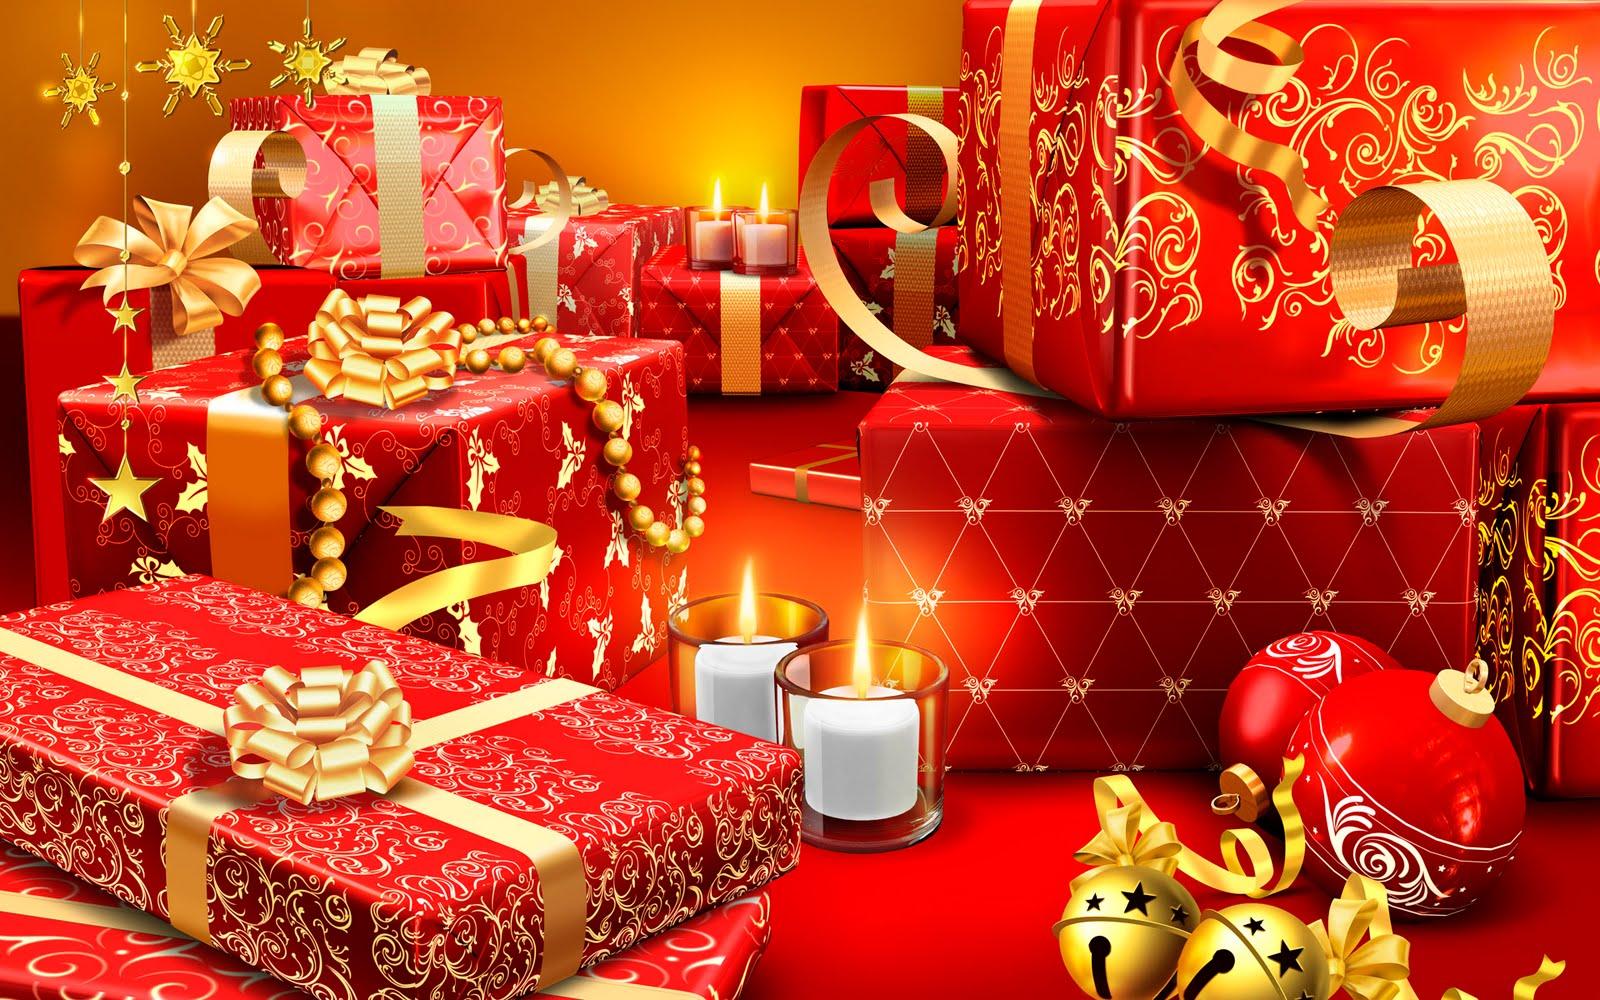 http://1.bp.blogspot.com/_XZtOBjNWtTs/TRAKOVdhEMI/AAAAAAAADP8/sYY5a6FmY7o/s1600/Christmas%2Bgifts.jpg